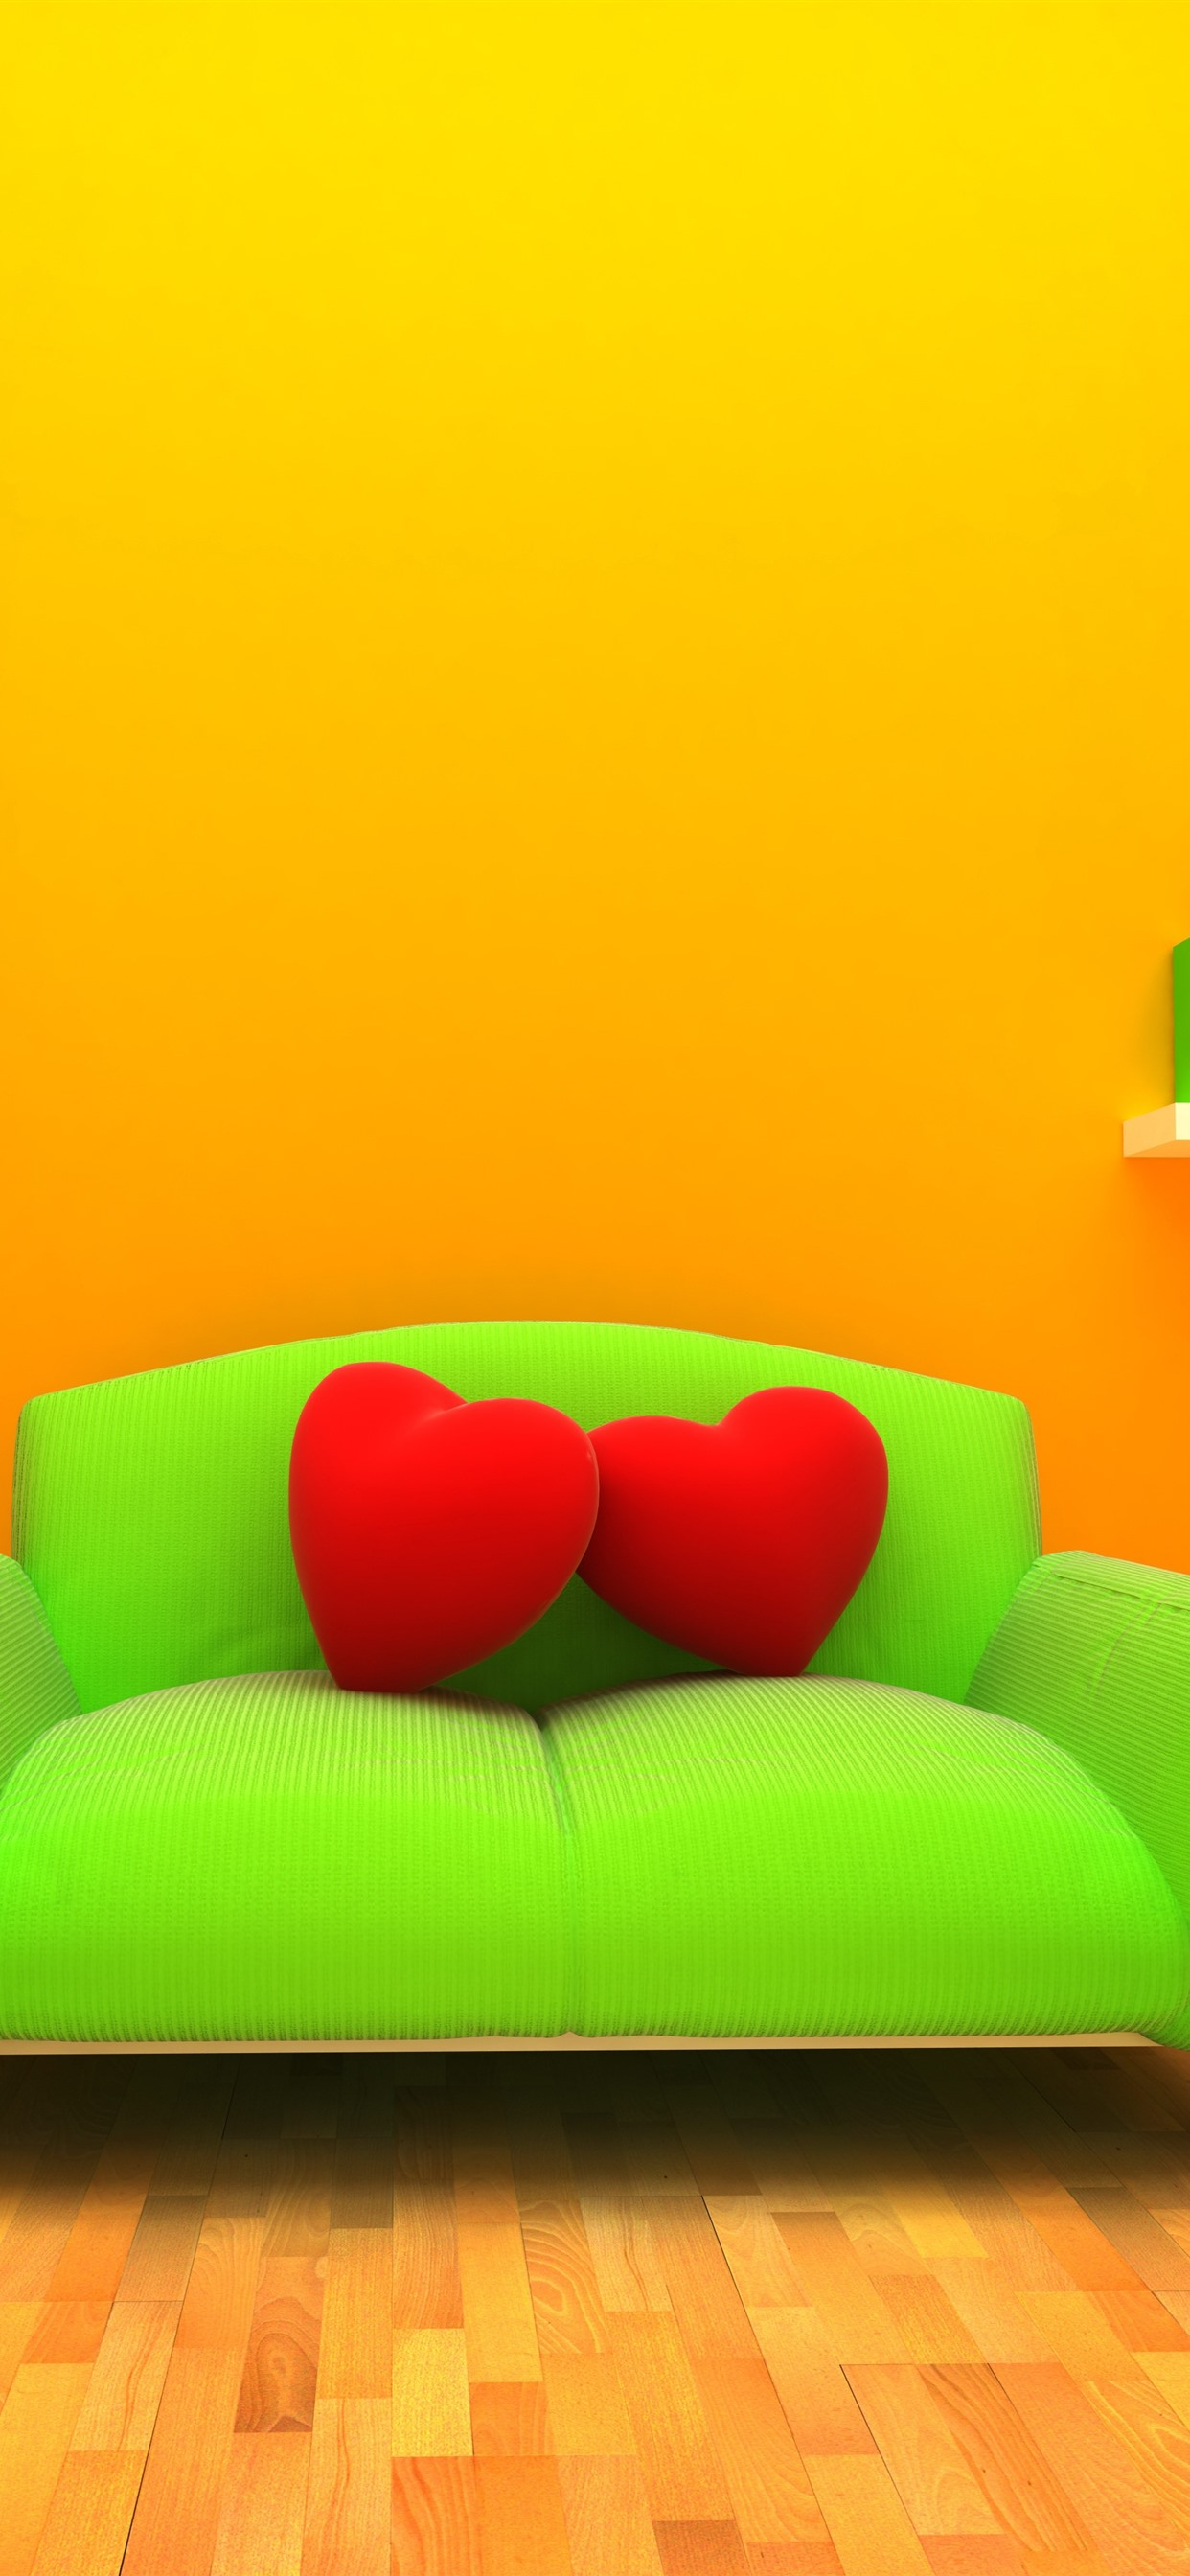 Green Sofa Red Love Heart Pillow Lamp Books Orange